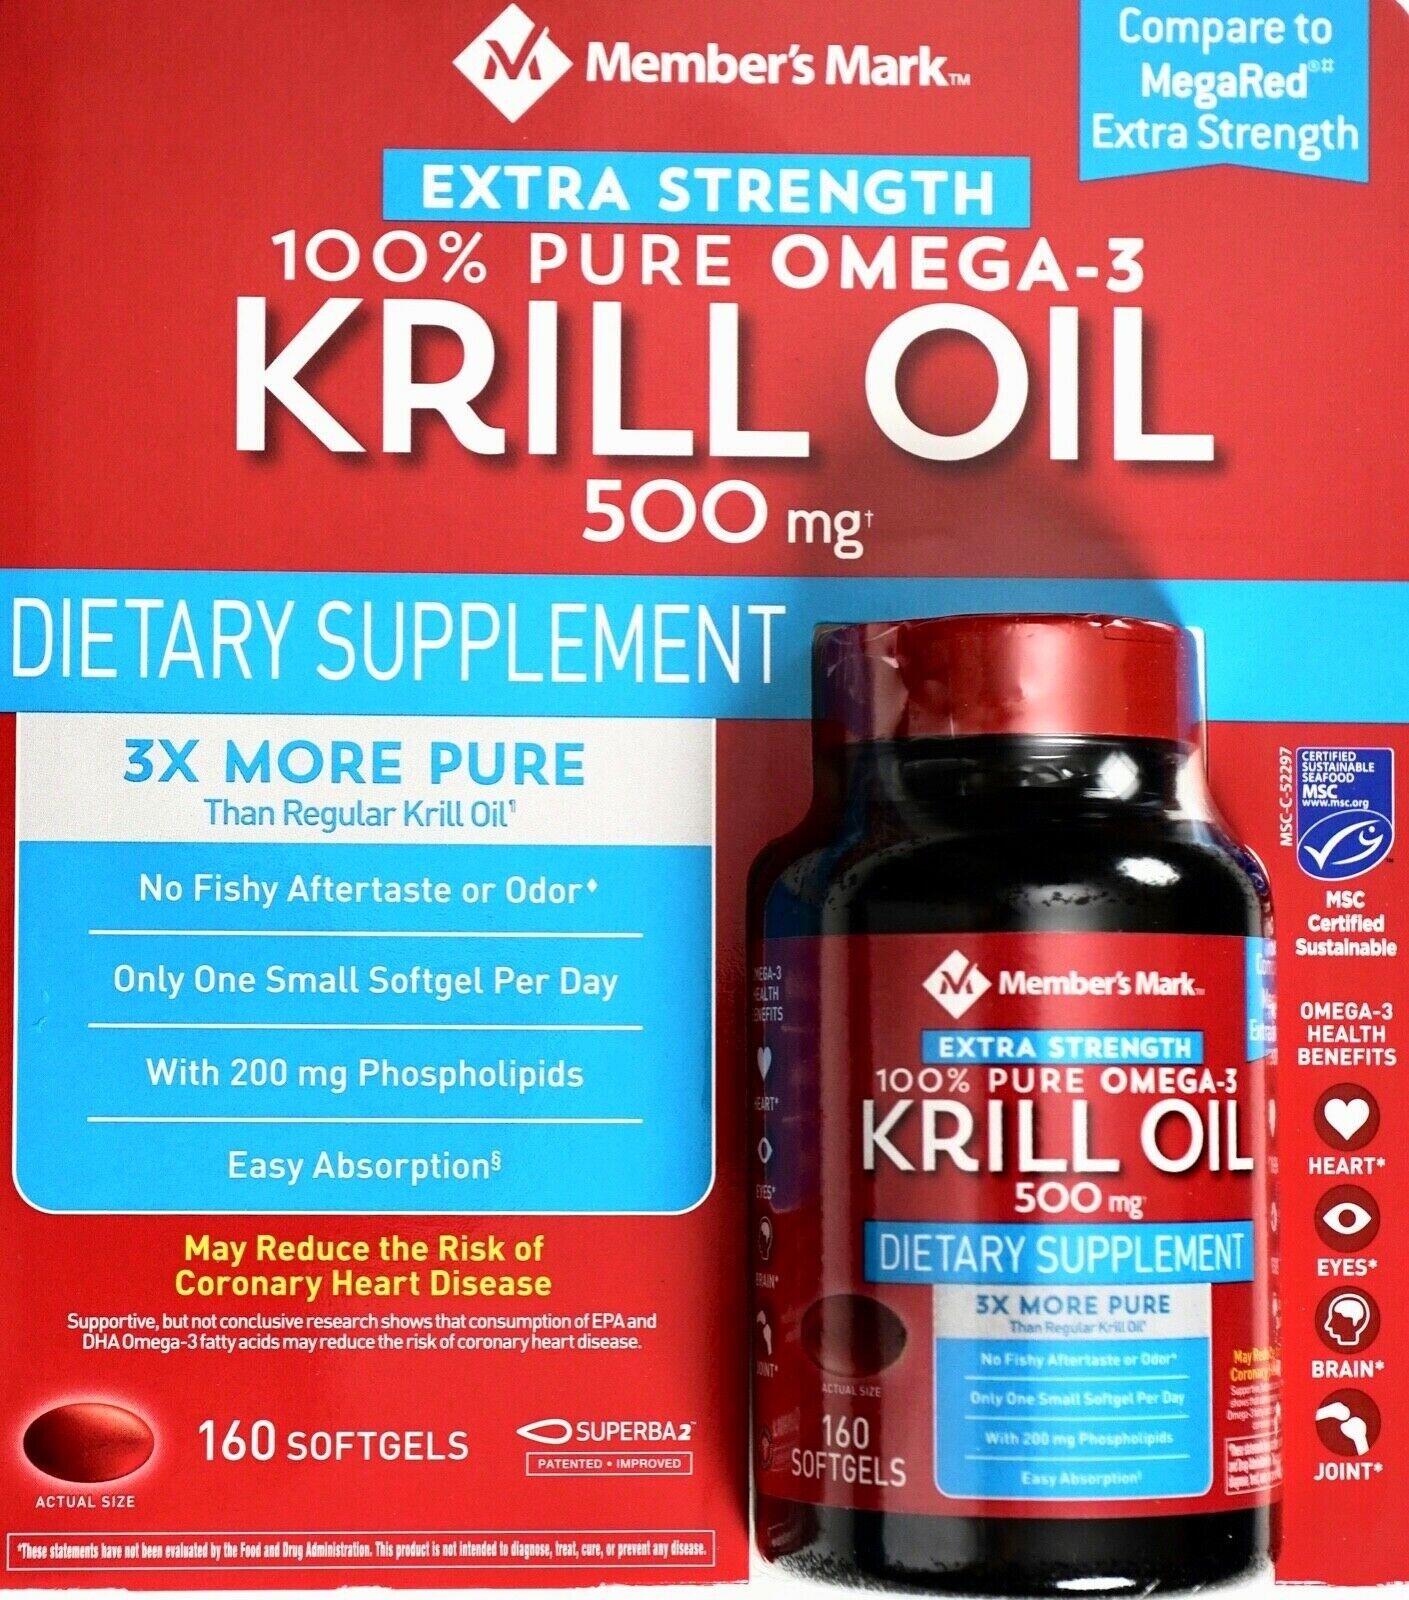 Member's Mark Extra-Strength 100% Pure Omega-3 Krill Oil 500mg Softgels